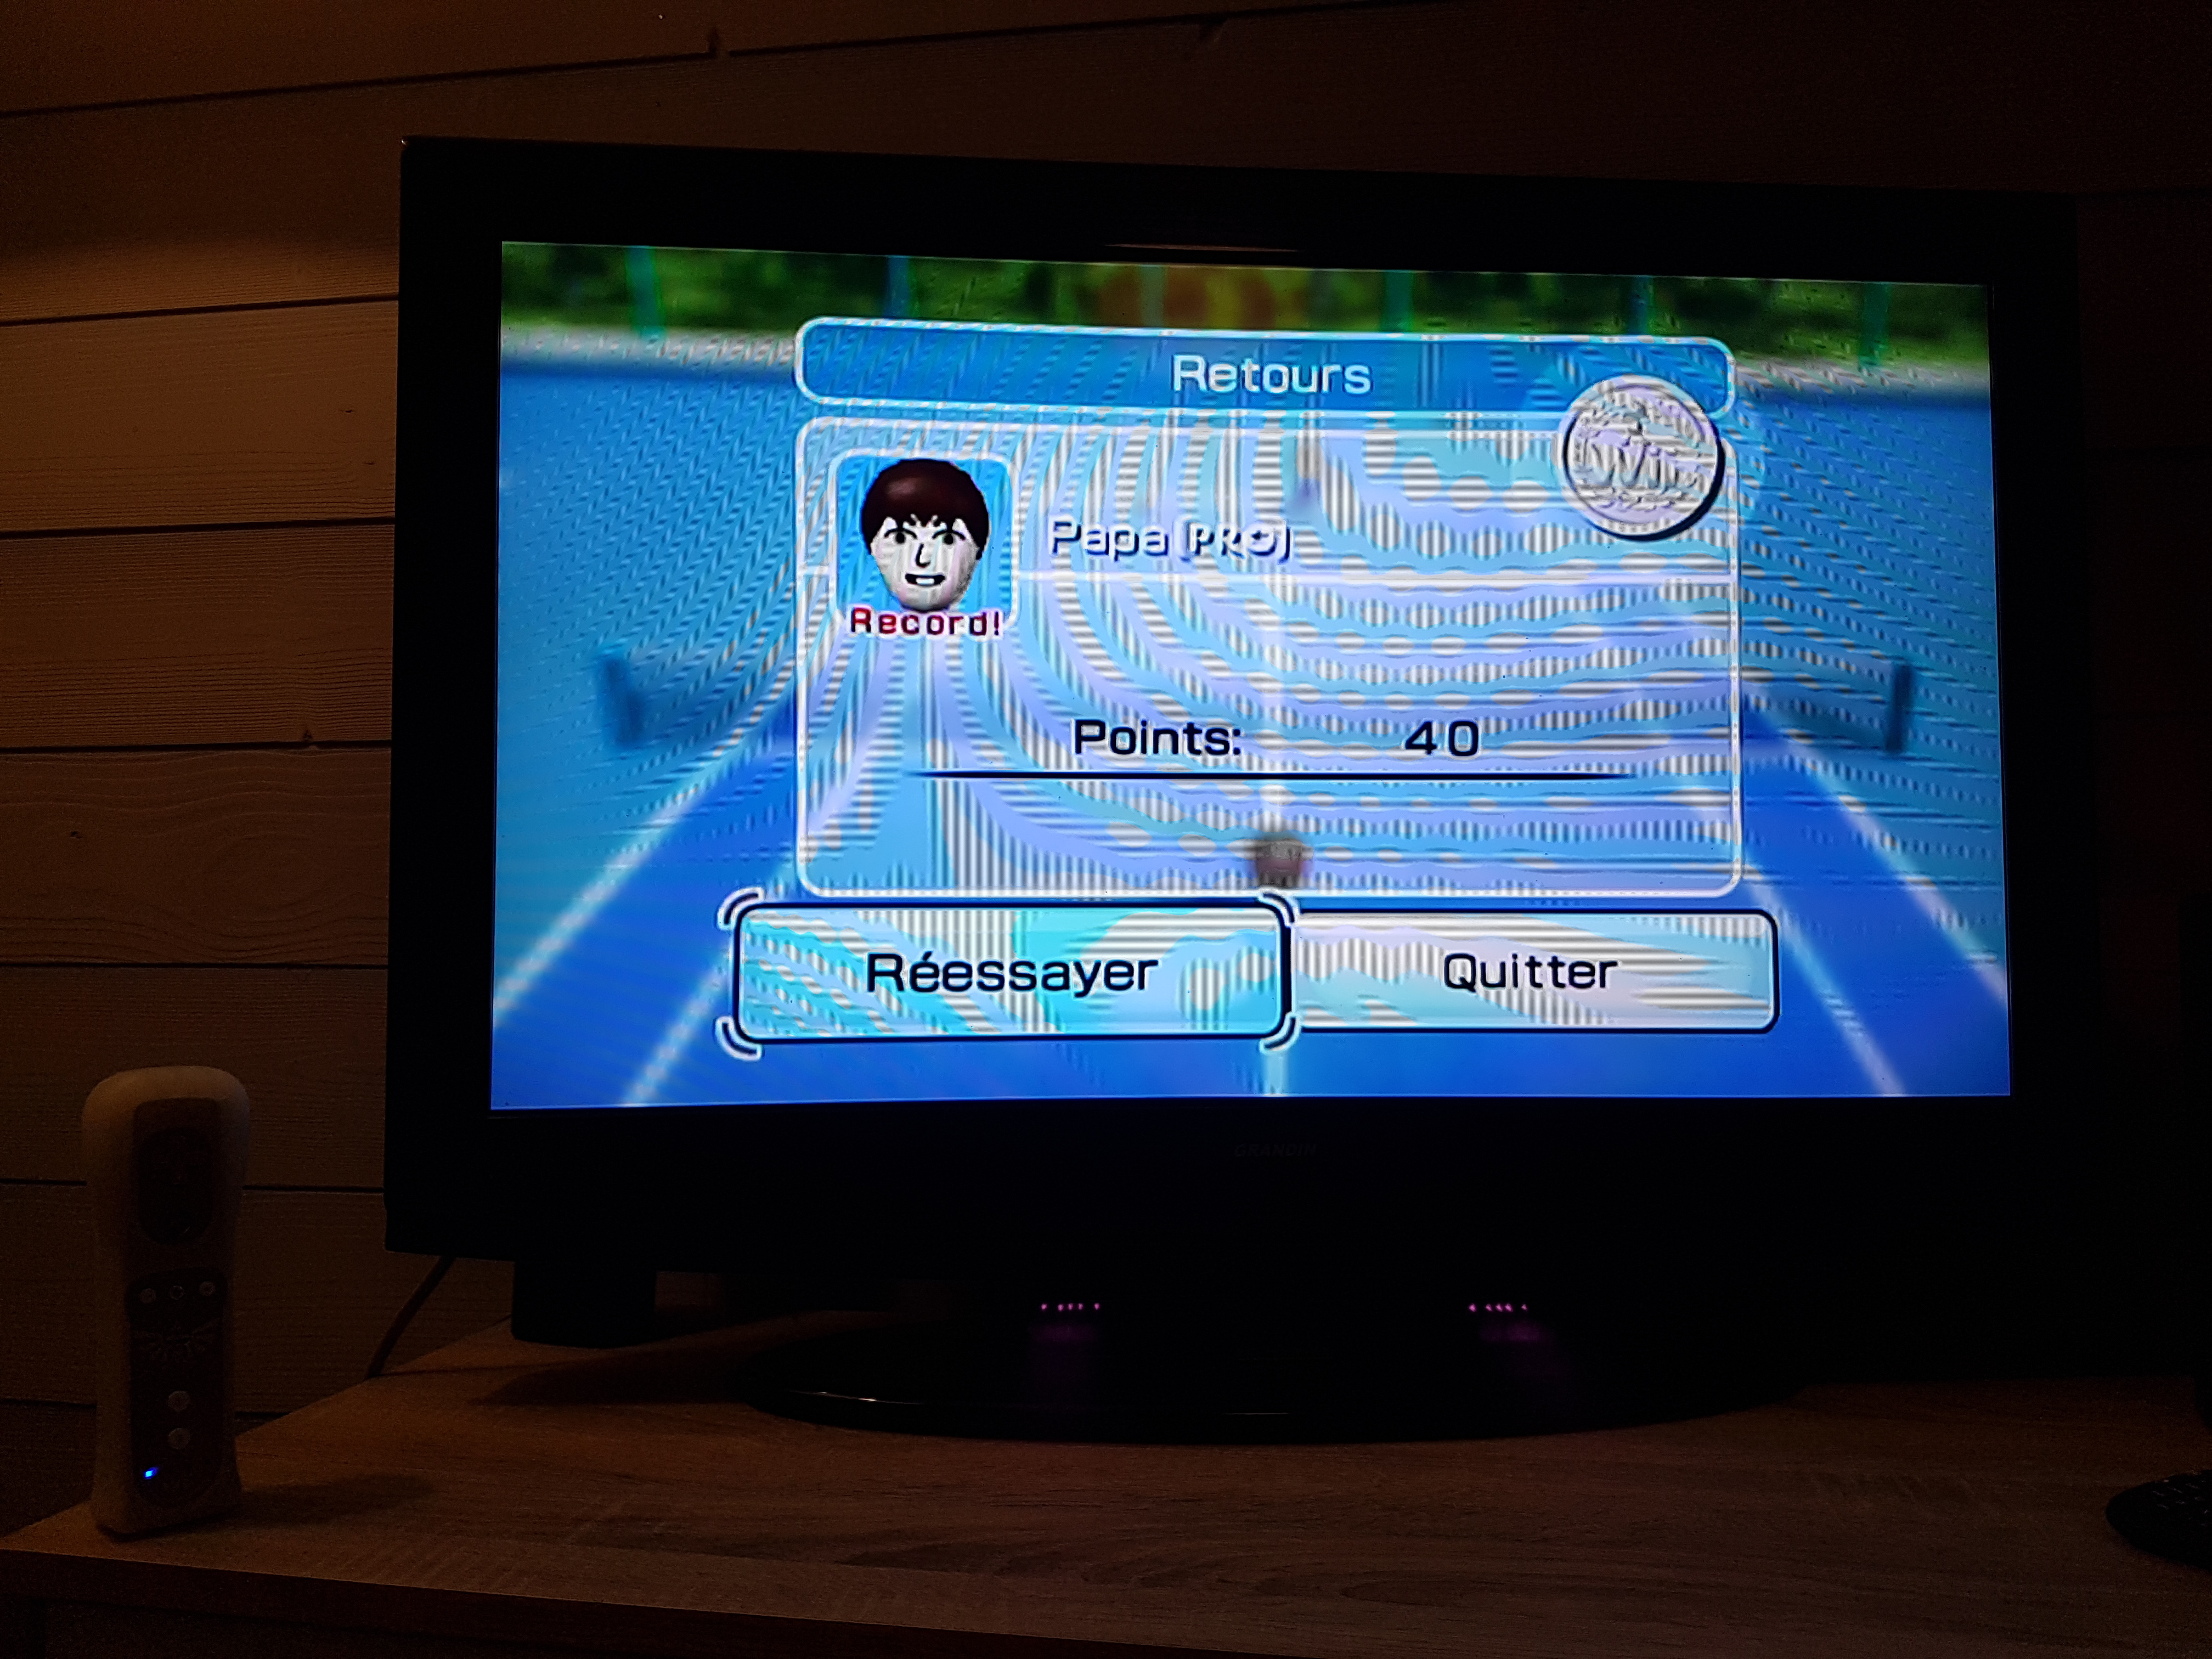 EddieNiceguy: Wii Sports: Tennis [Returning Balls] (Wii) 40 points on 2018-01-22 14:37:13